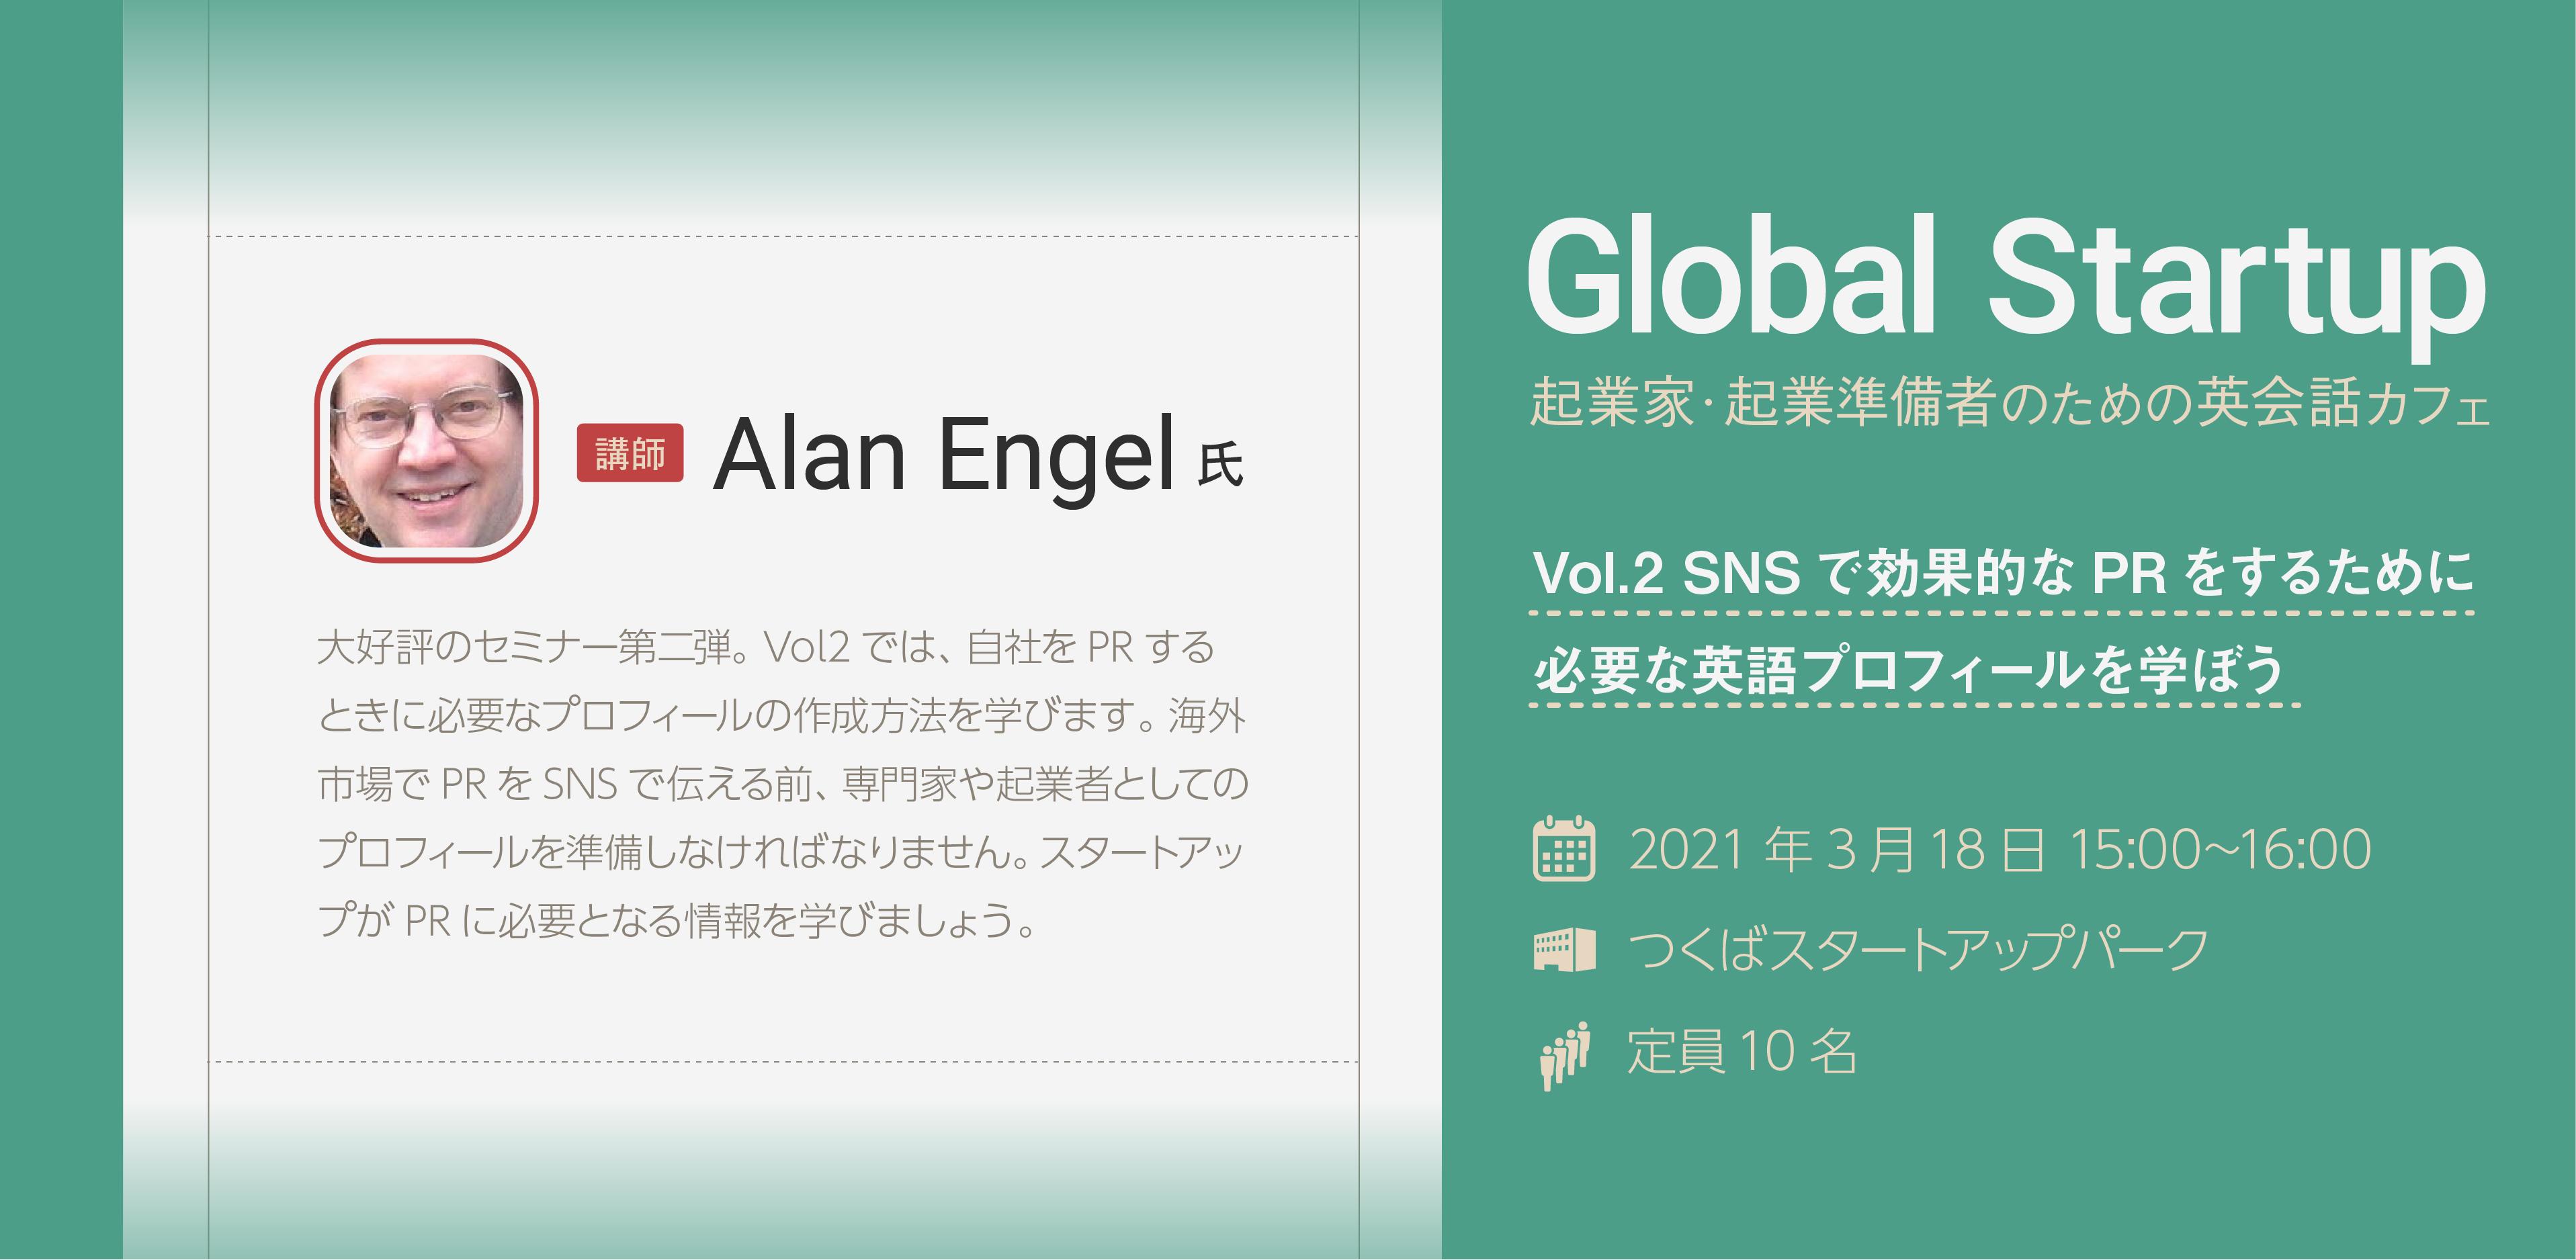 Global Startup 起業家・起業準備者のための英会話カフェ